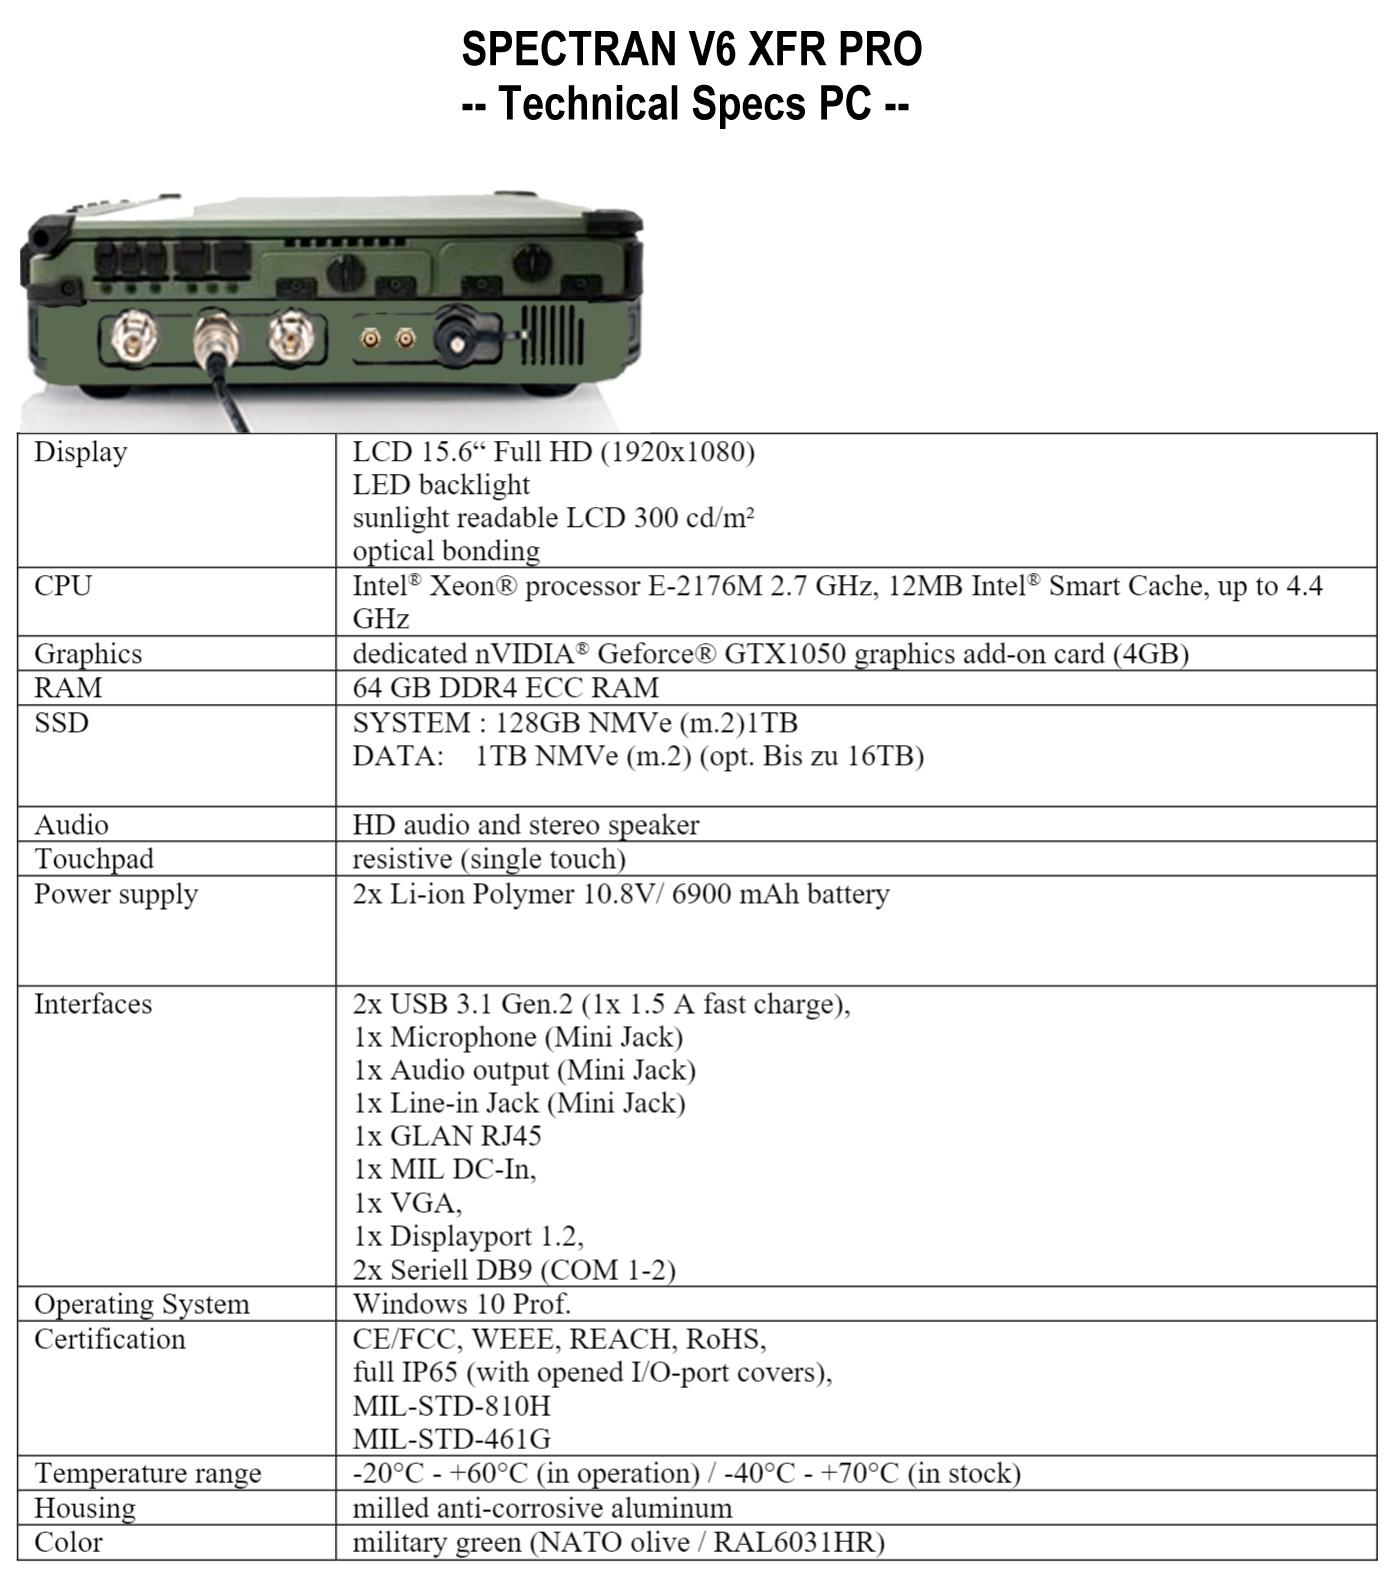 Counter Surveillance Military Laptop SPECTRAN V6 XFR PRO